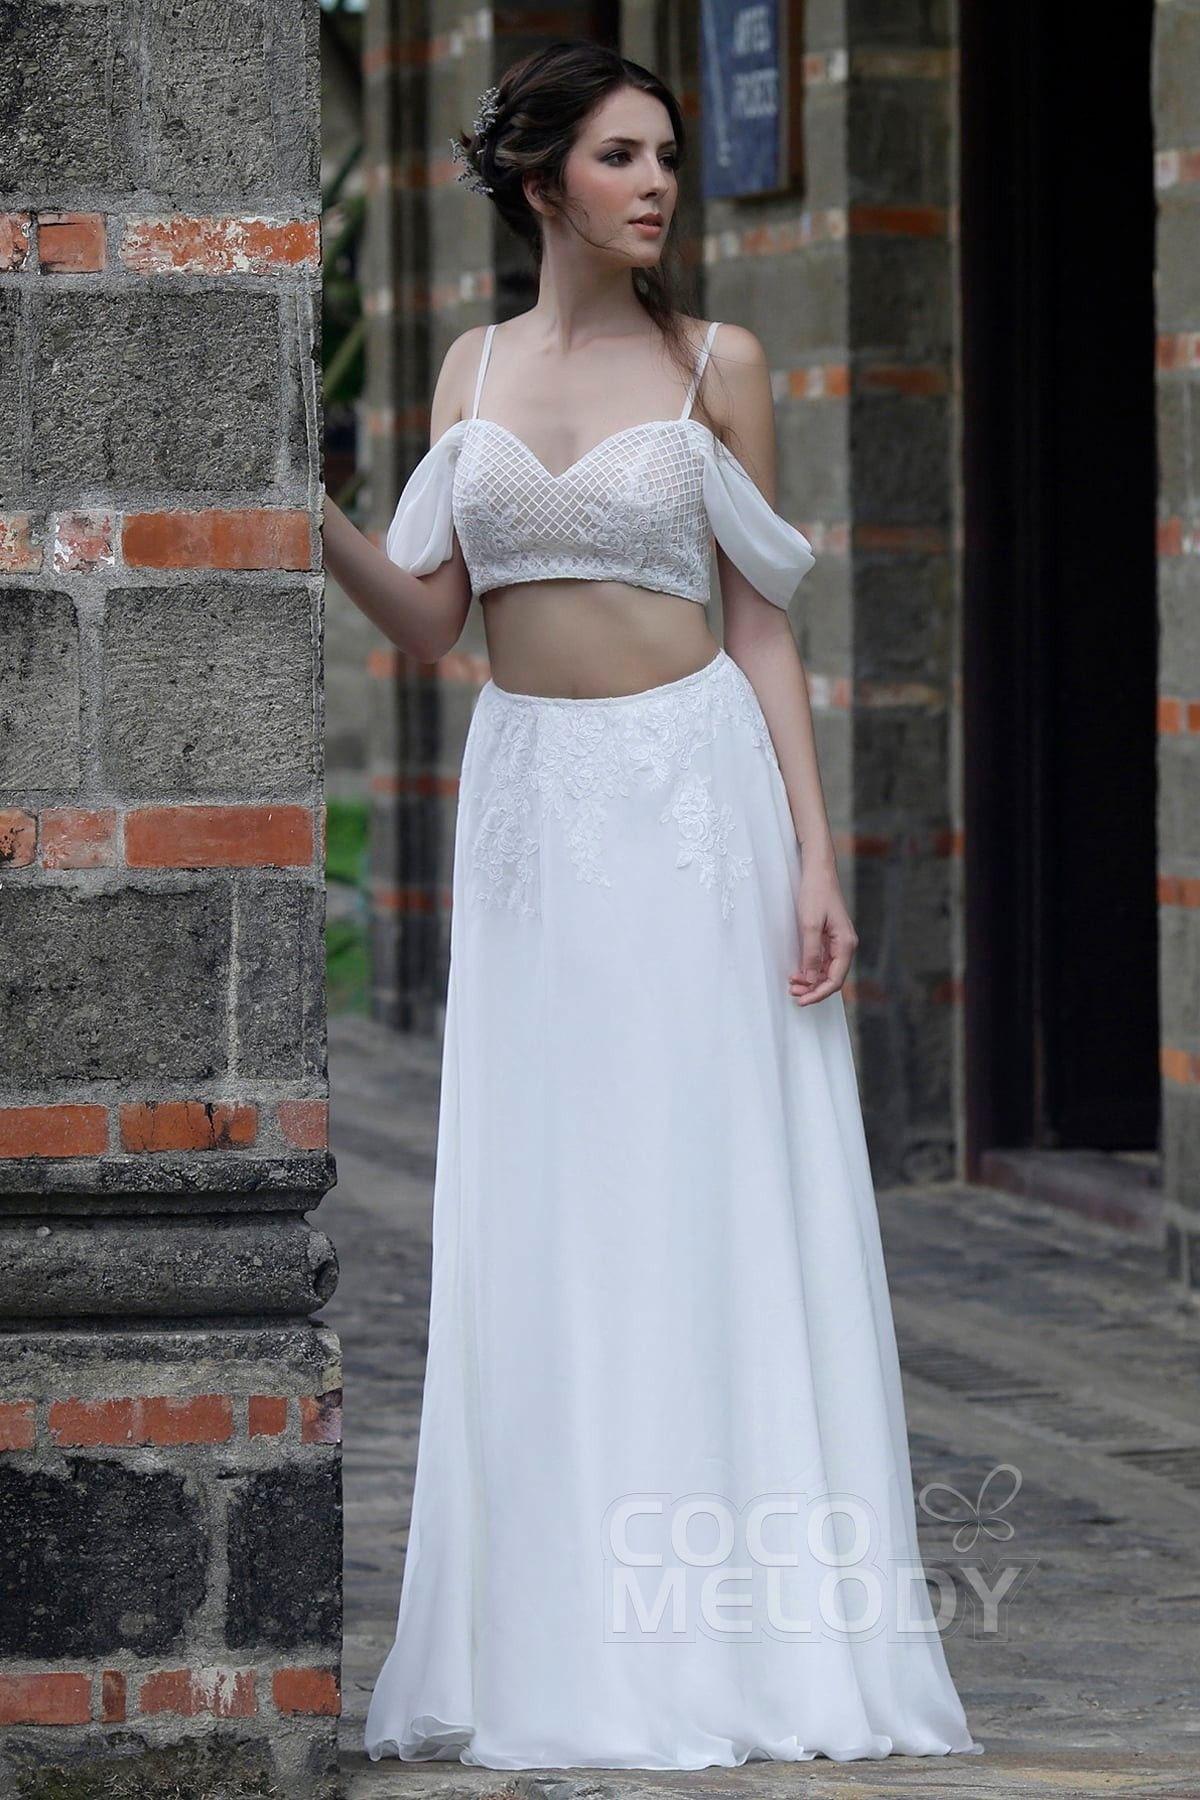 Usd 699 Crop Top Train Tulle Chiffon Wedding Dress Ld5362